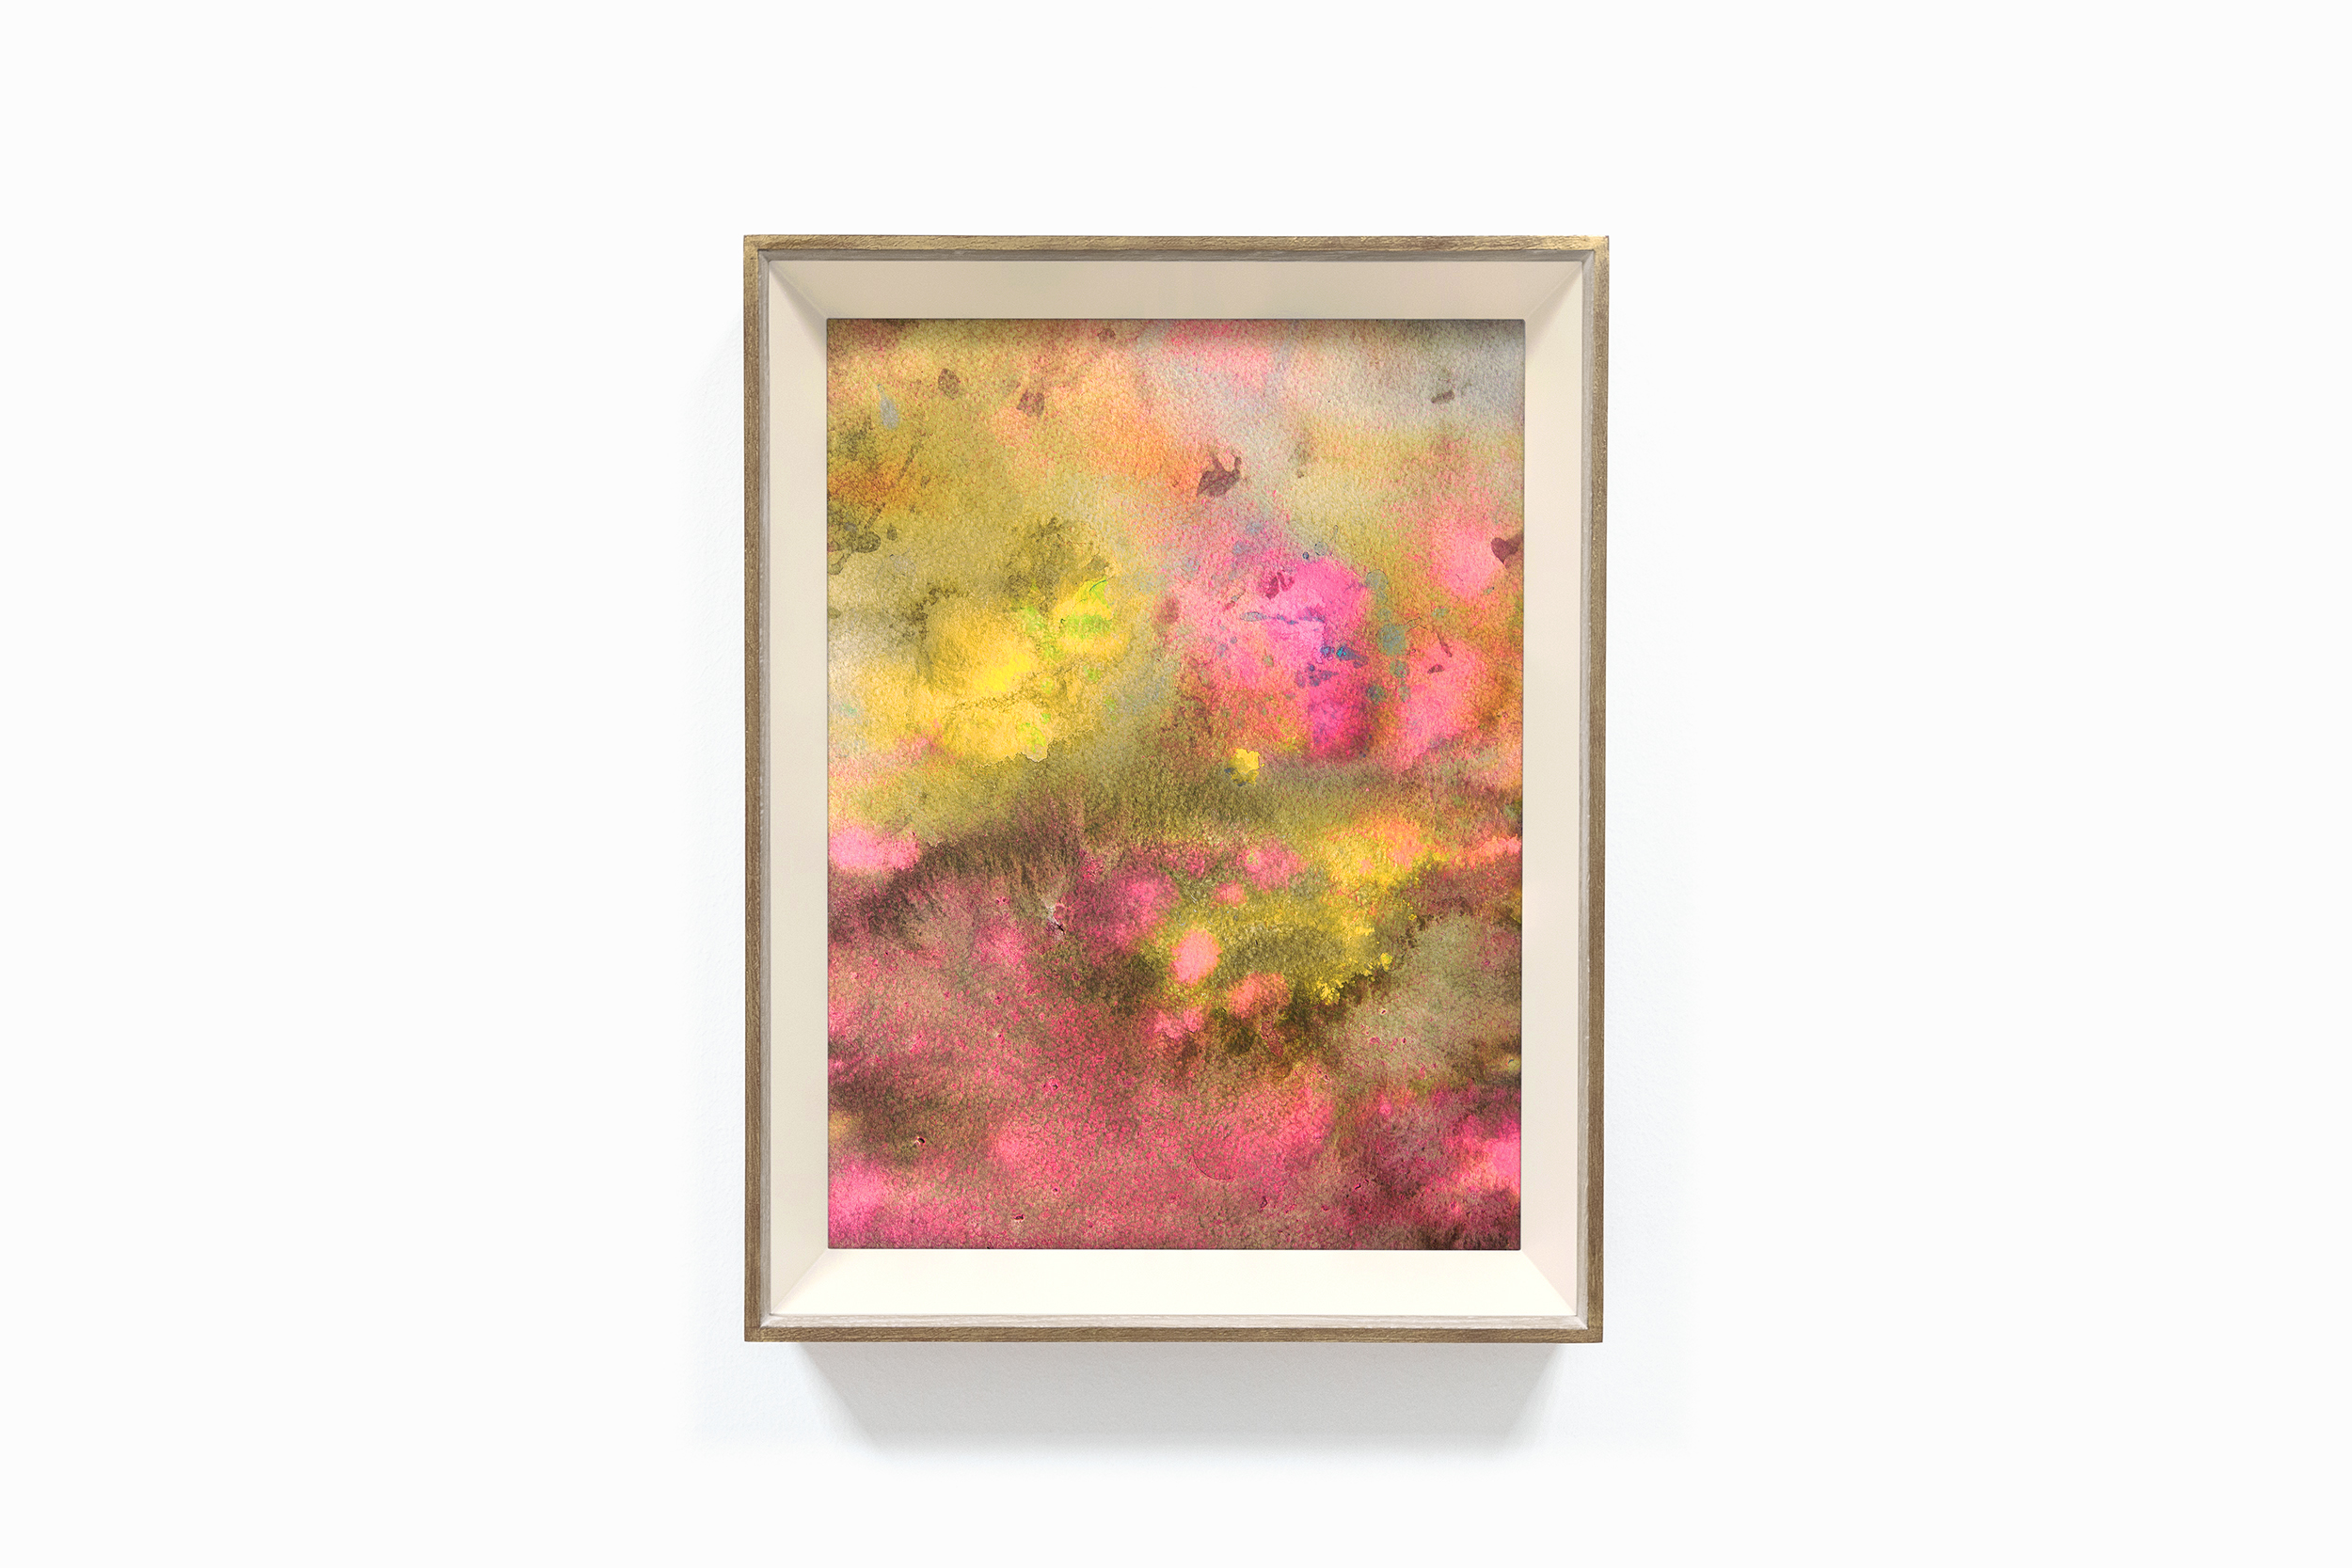 bonjourmolotov Dust Illustration Ilustracao painting pintura acrylic acrílico canvas tela paper cardboard mdf Andre Gigante 04N.jpg